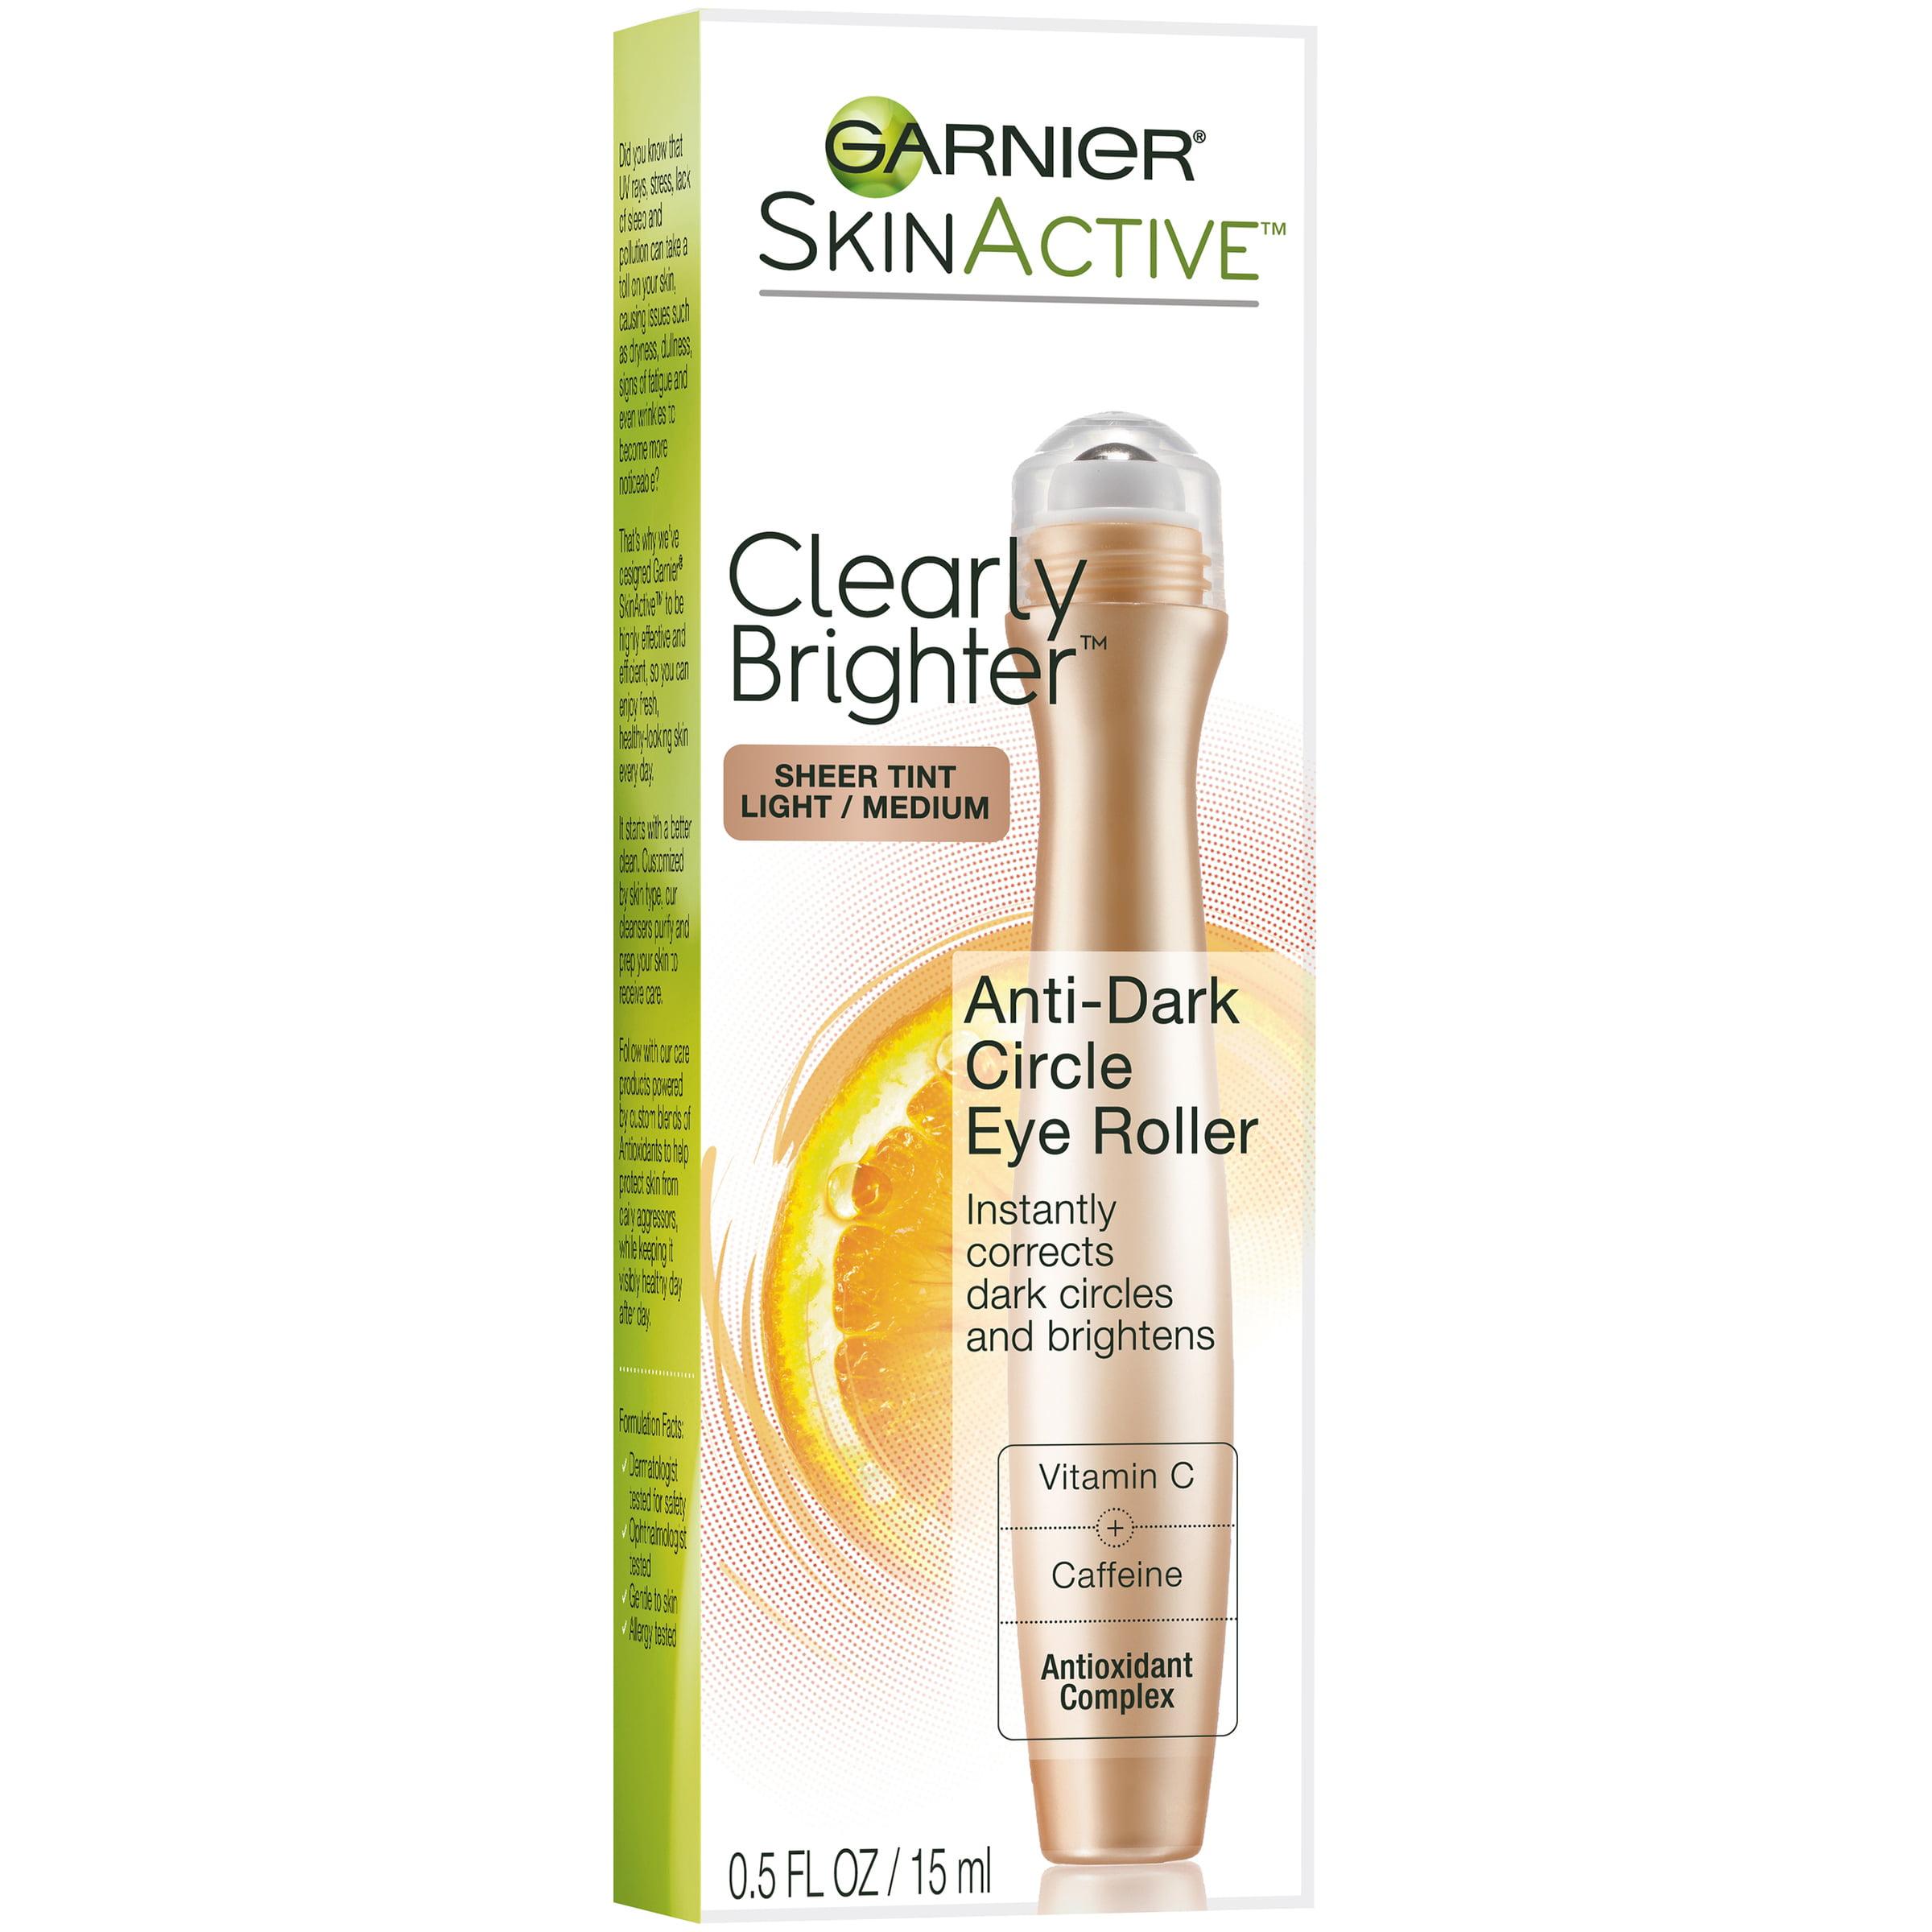 Garnier SkinActive Clearly Brighter Sheer Tint Light/Medium Anti-Dark Circle Eye Roller 0.5 fl. oz. Box